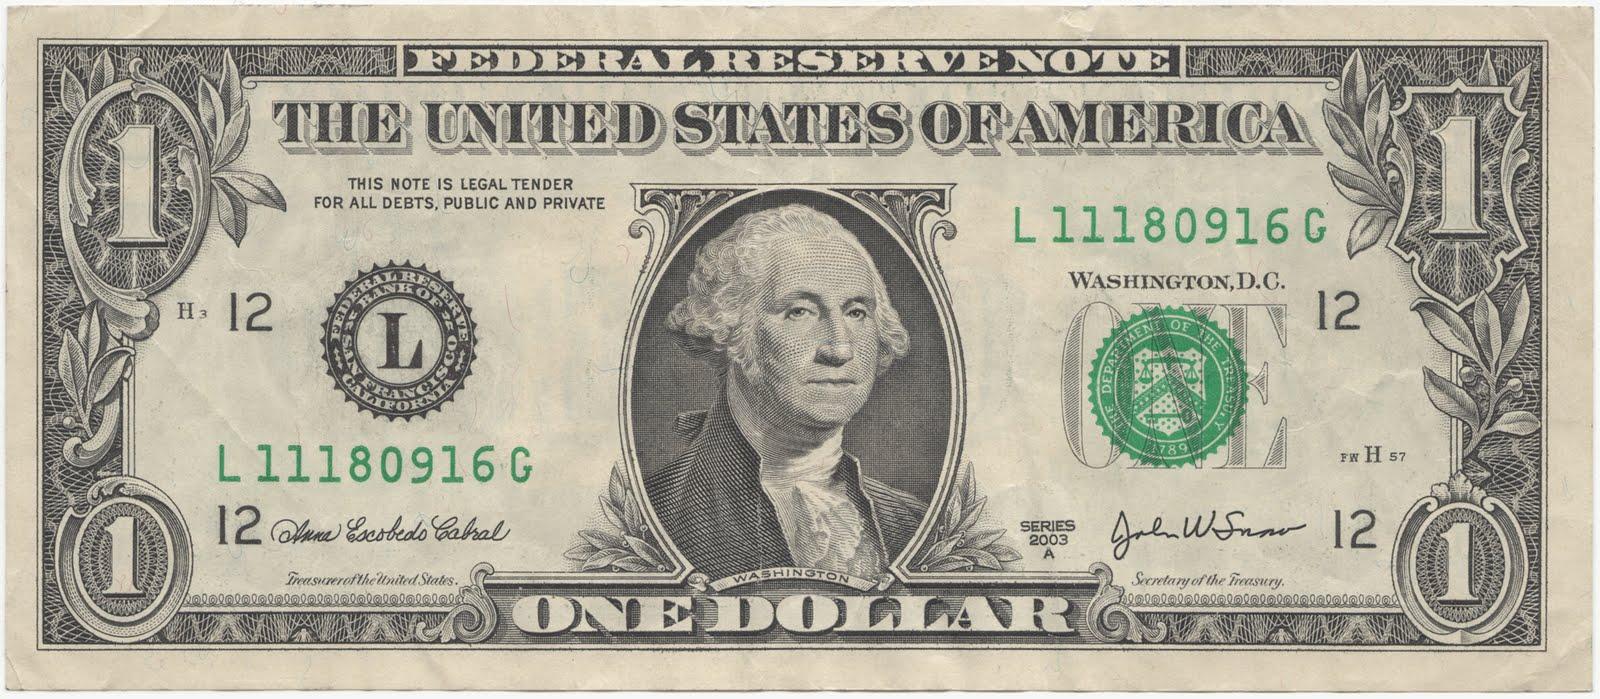 Dollar Bill Clip Art Dollar ... Image Image Image Image Image.